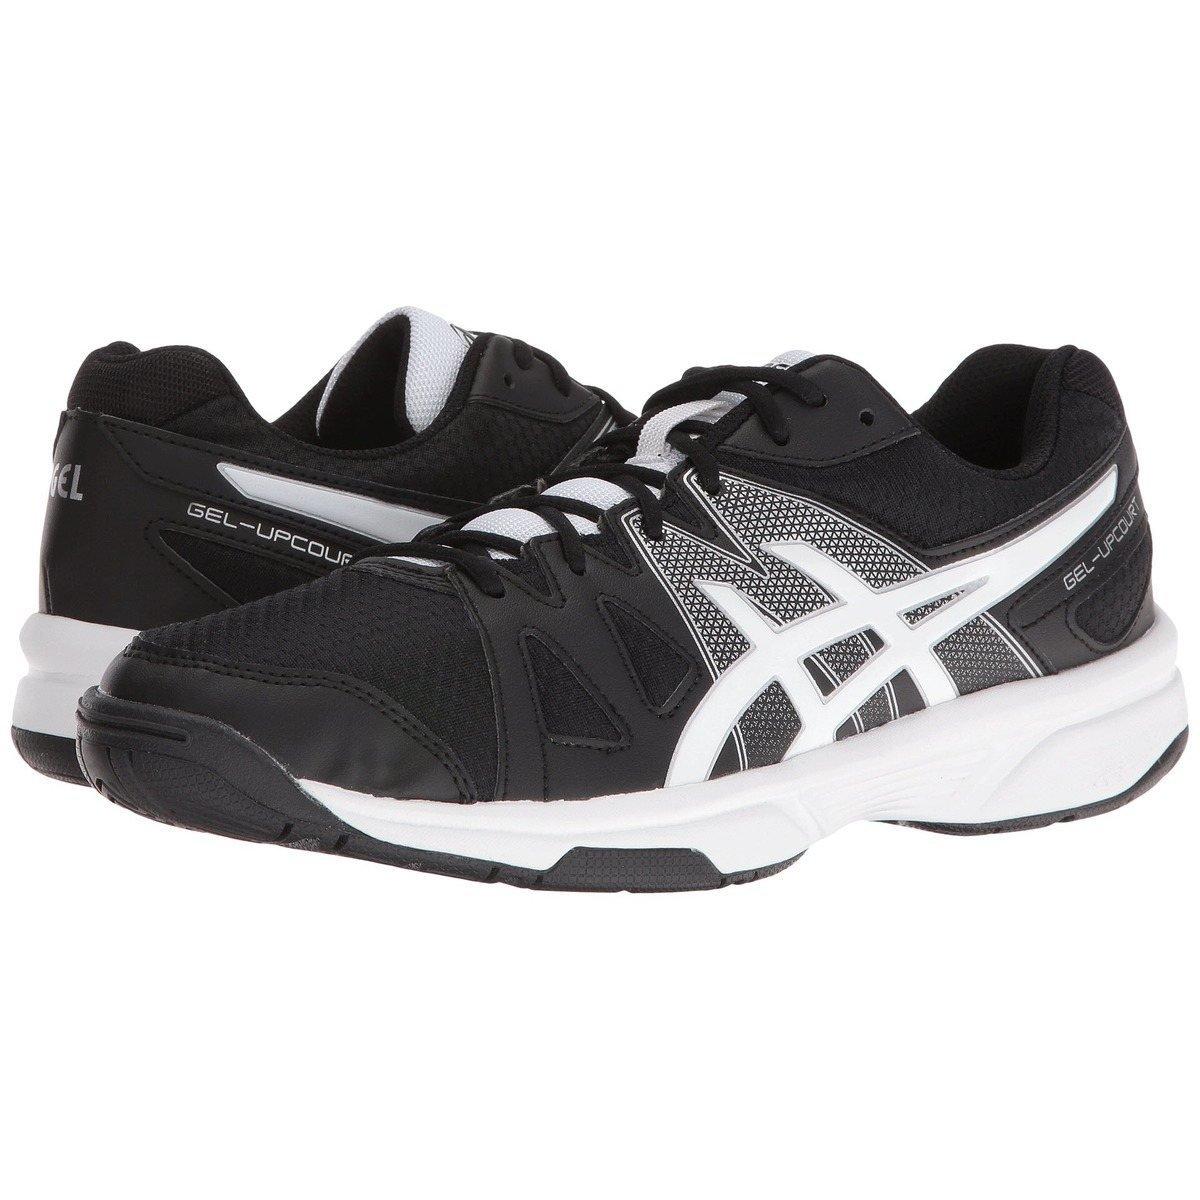 Asics - Gel Upcourt - Men's - Court Shoes - Black/White/Silver 12886(base)